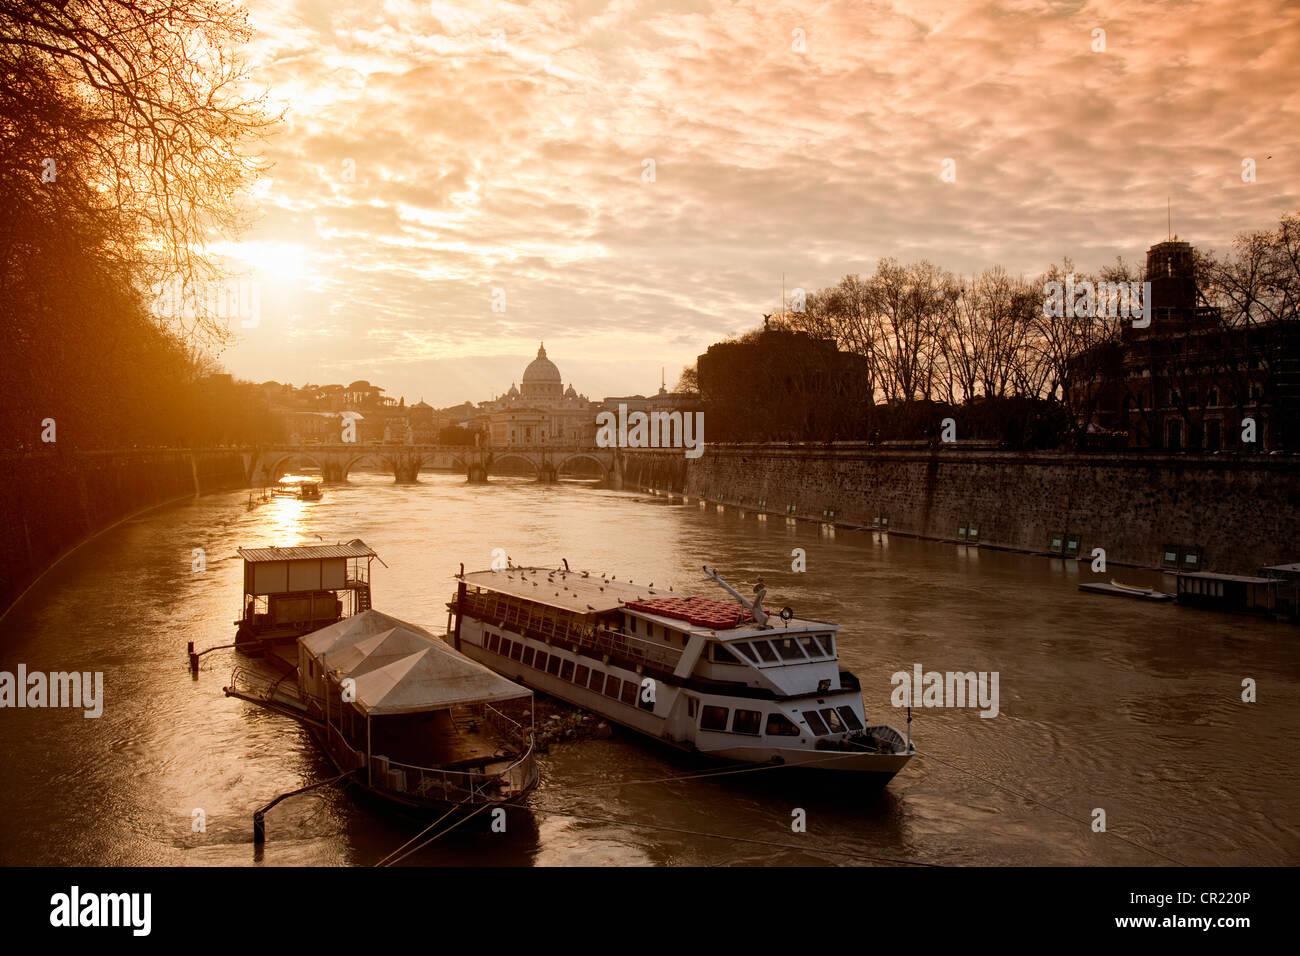 Voile sur urban canal Photo Stock